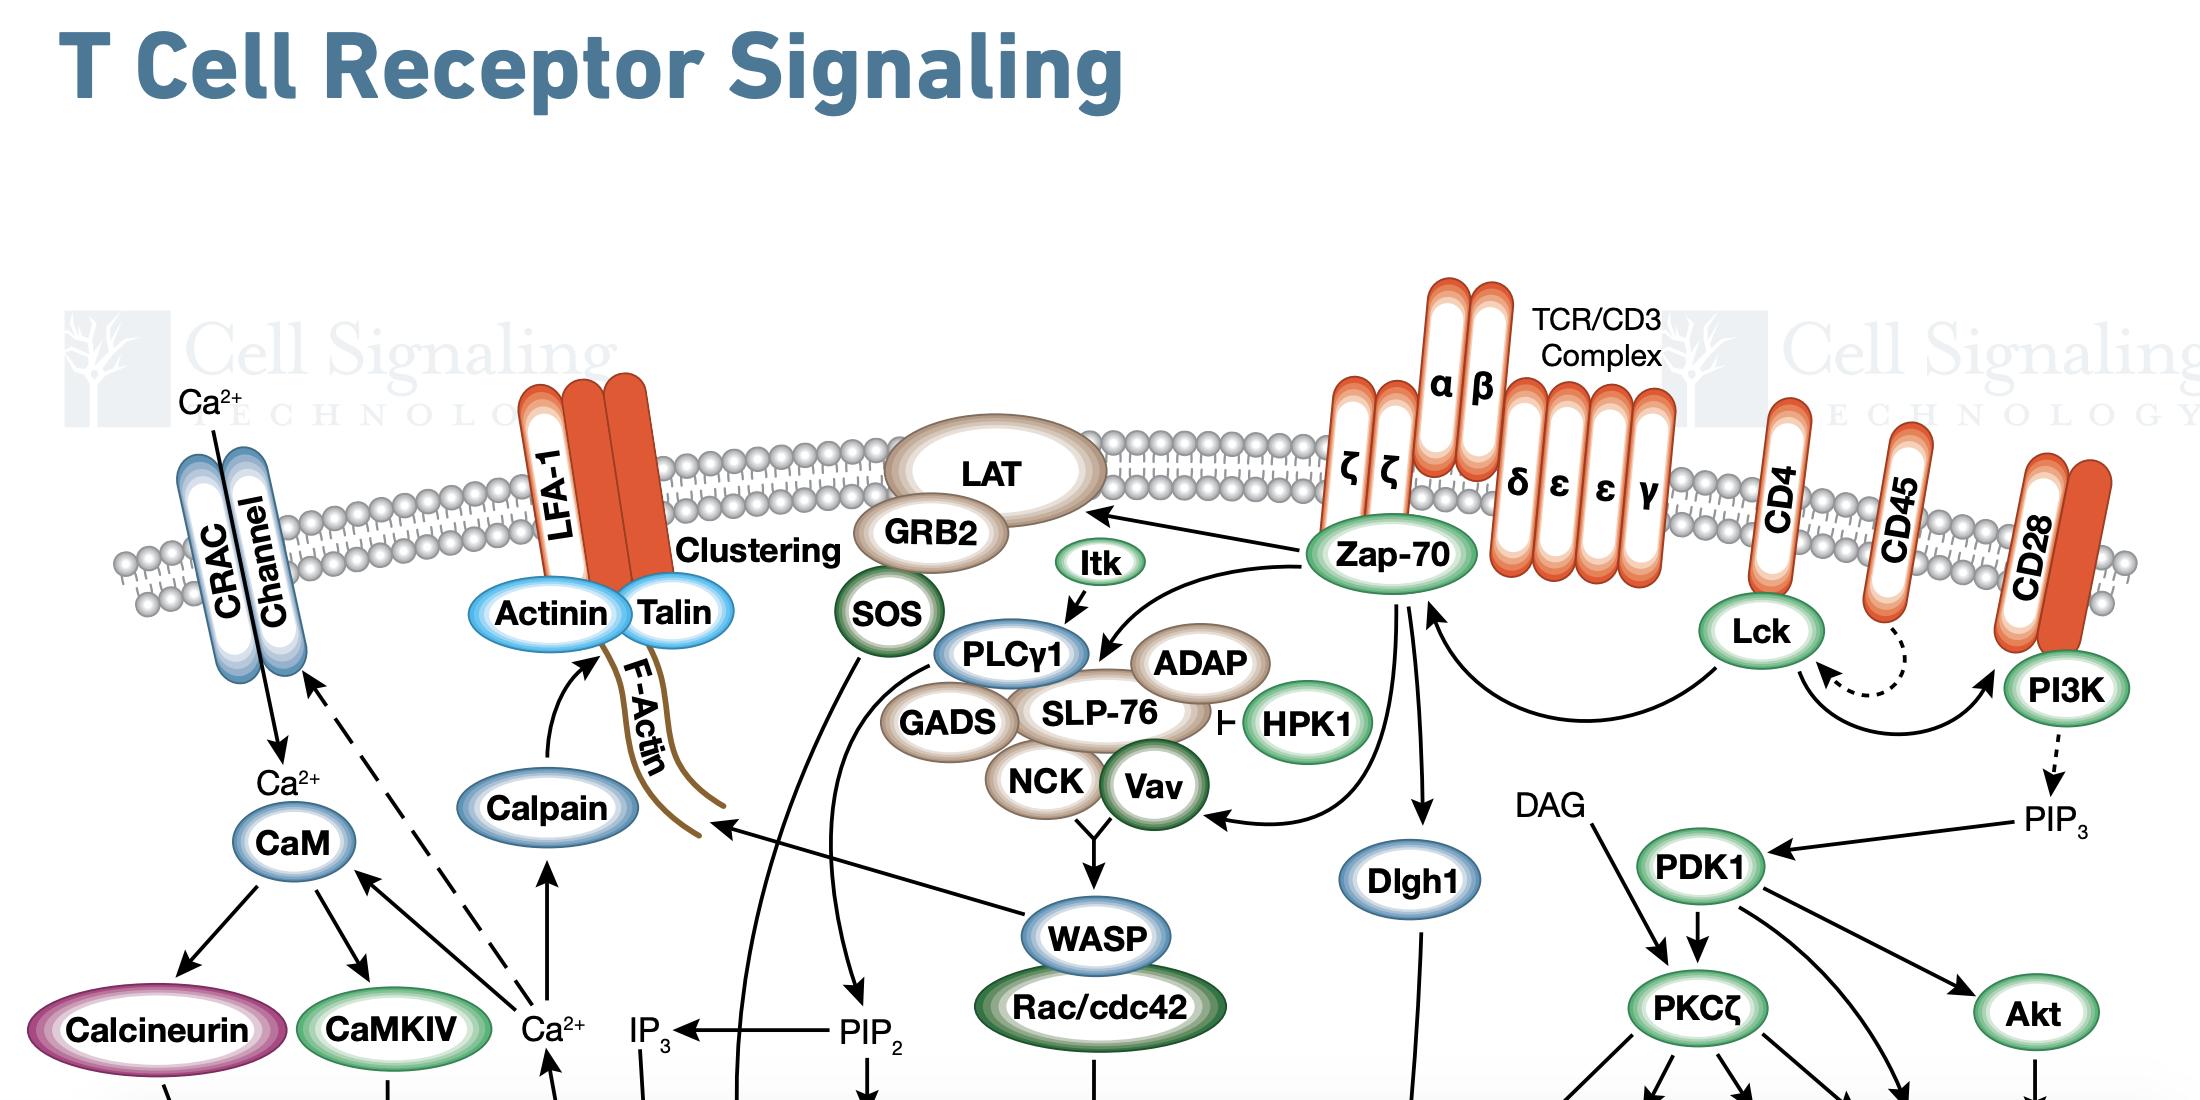 T Cell Receptor Signaling Diagram